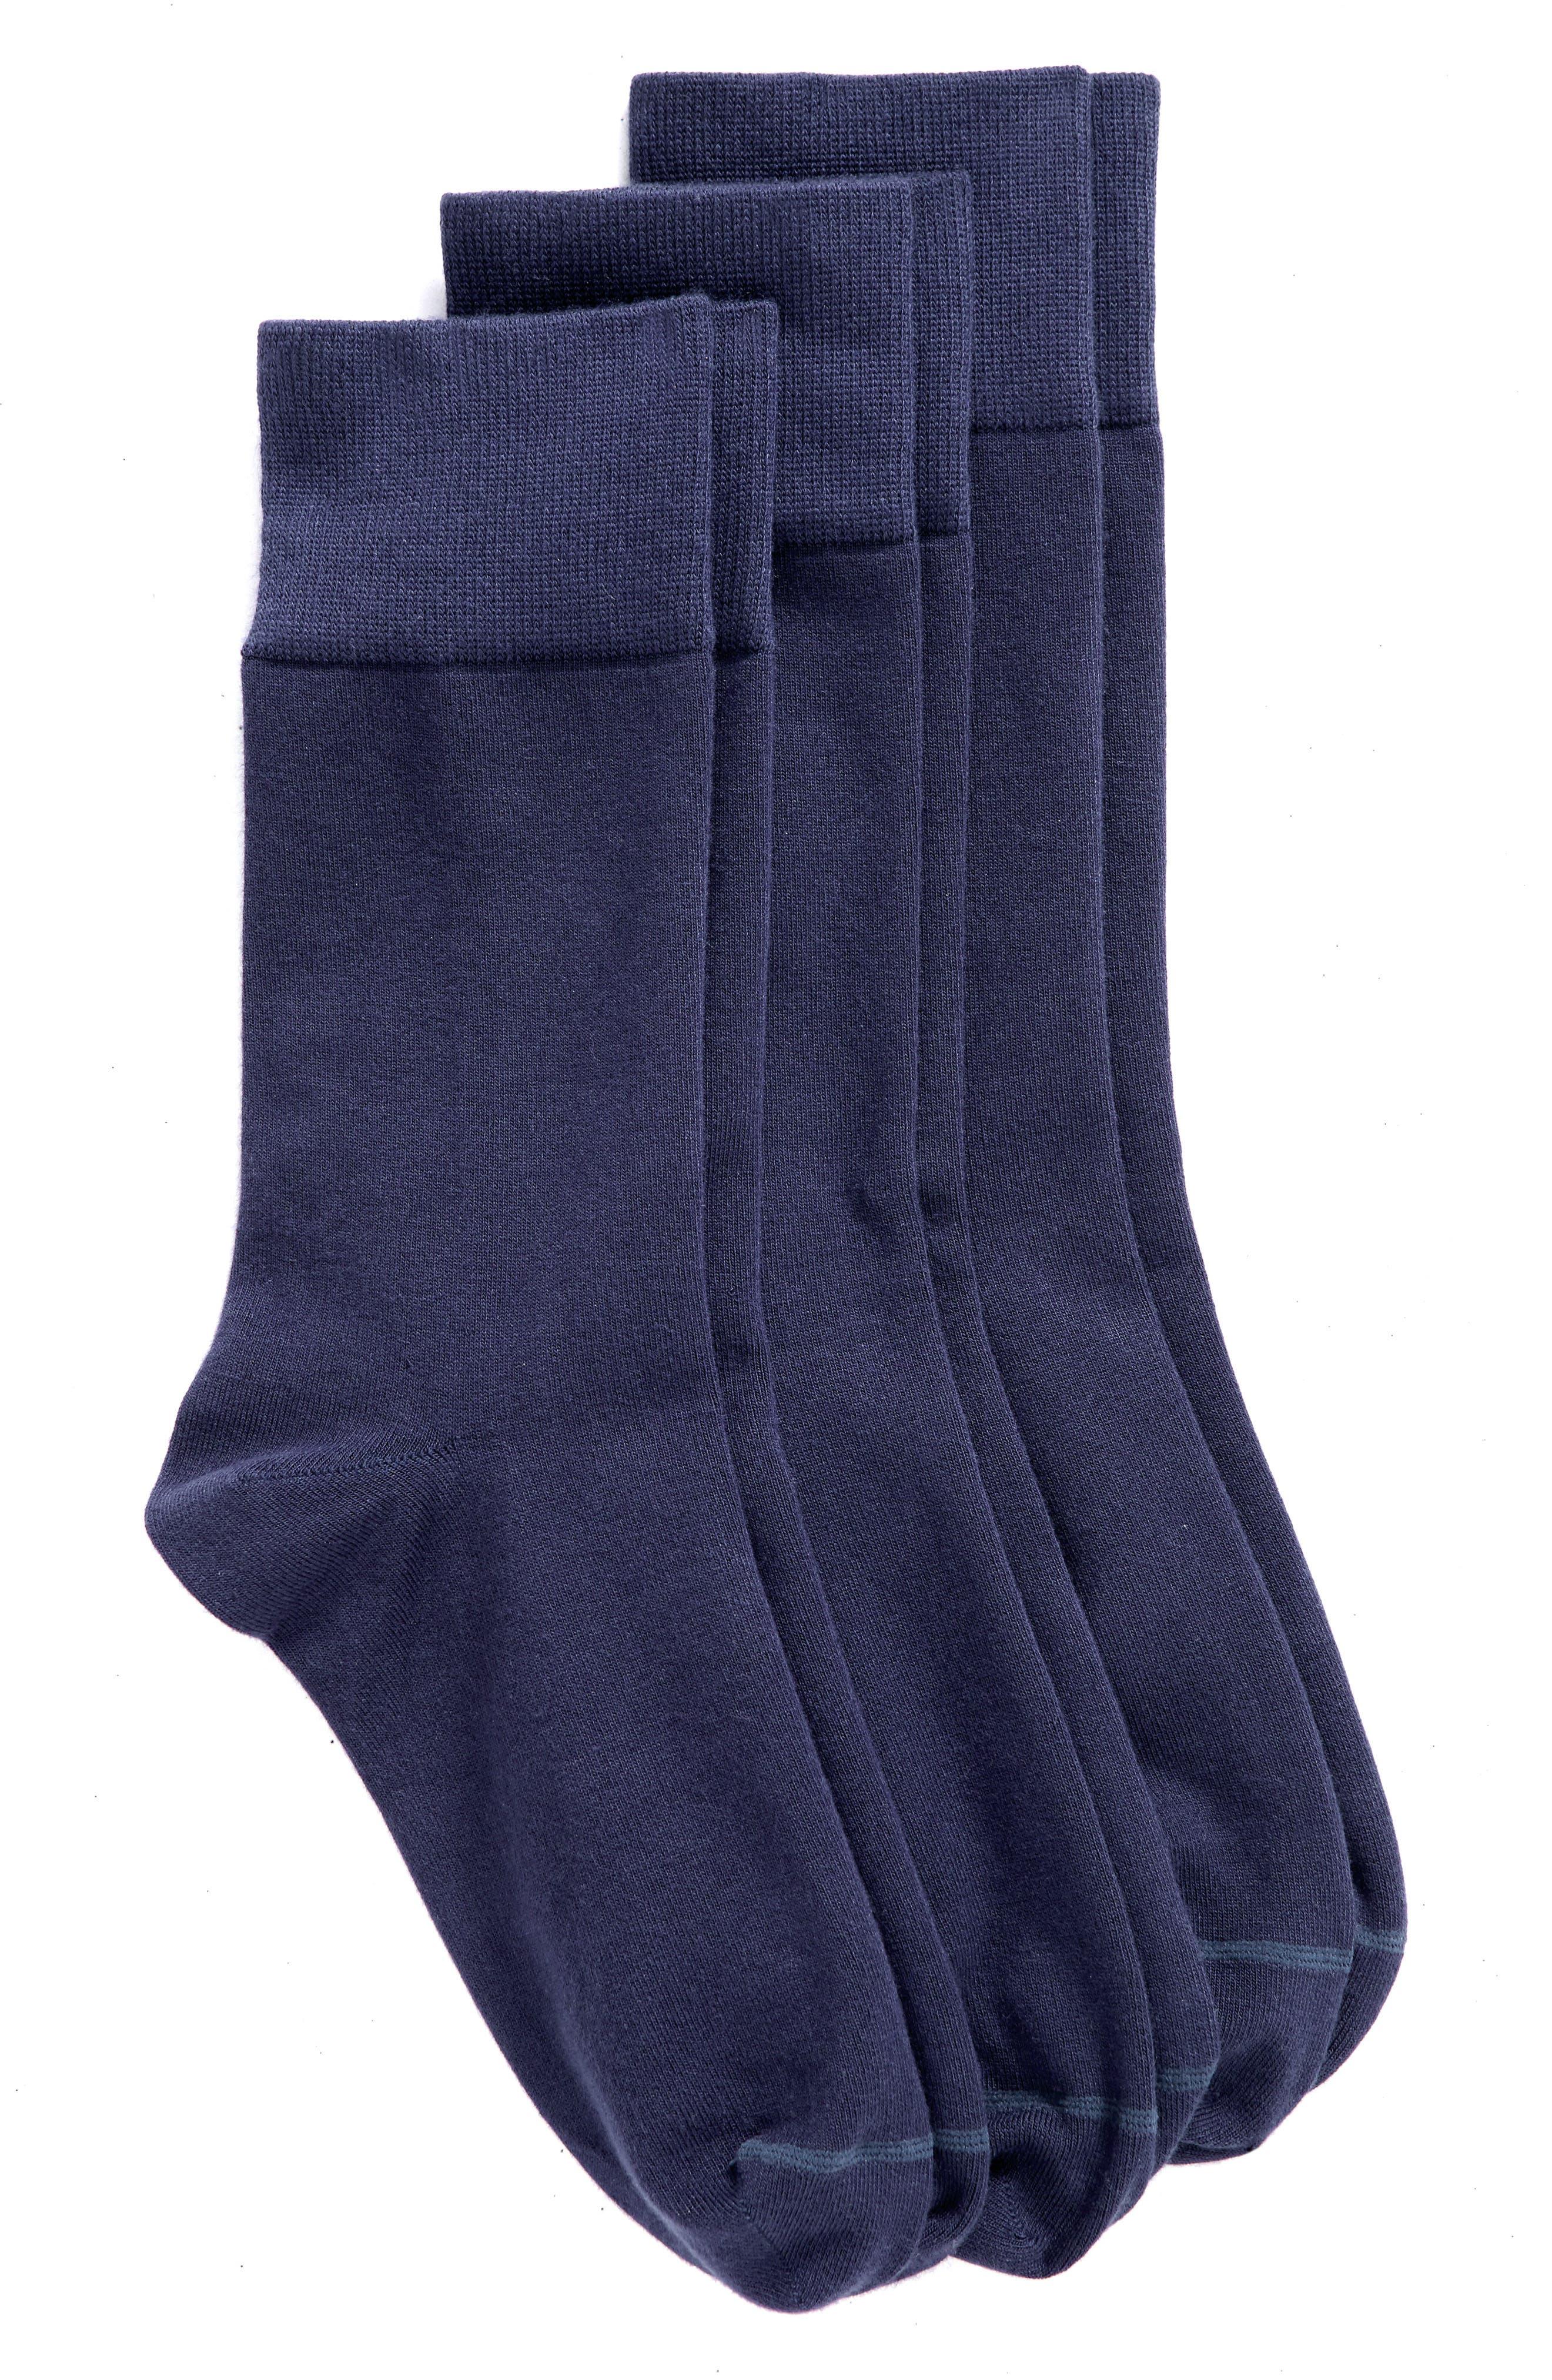 Main Image - Nordstrom Crew Socks (3-Pack)